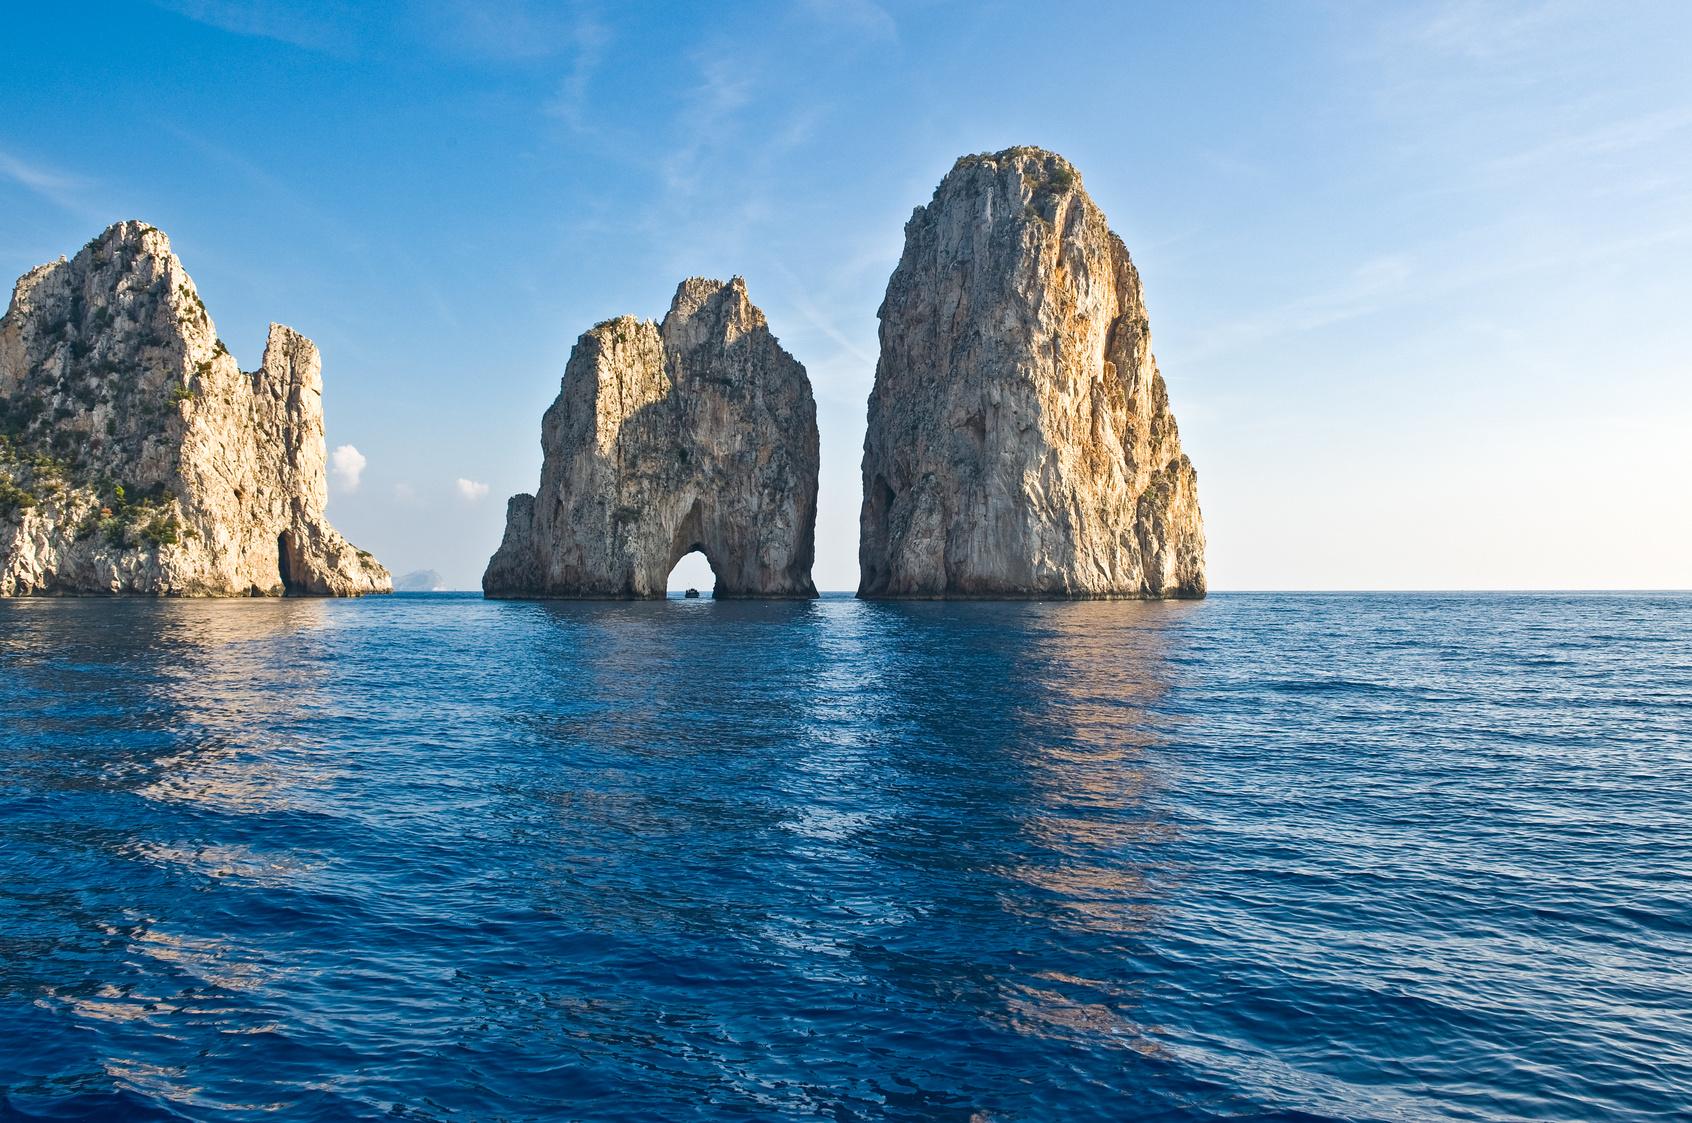 Italy,Capri the famous Faraglioni rocks